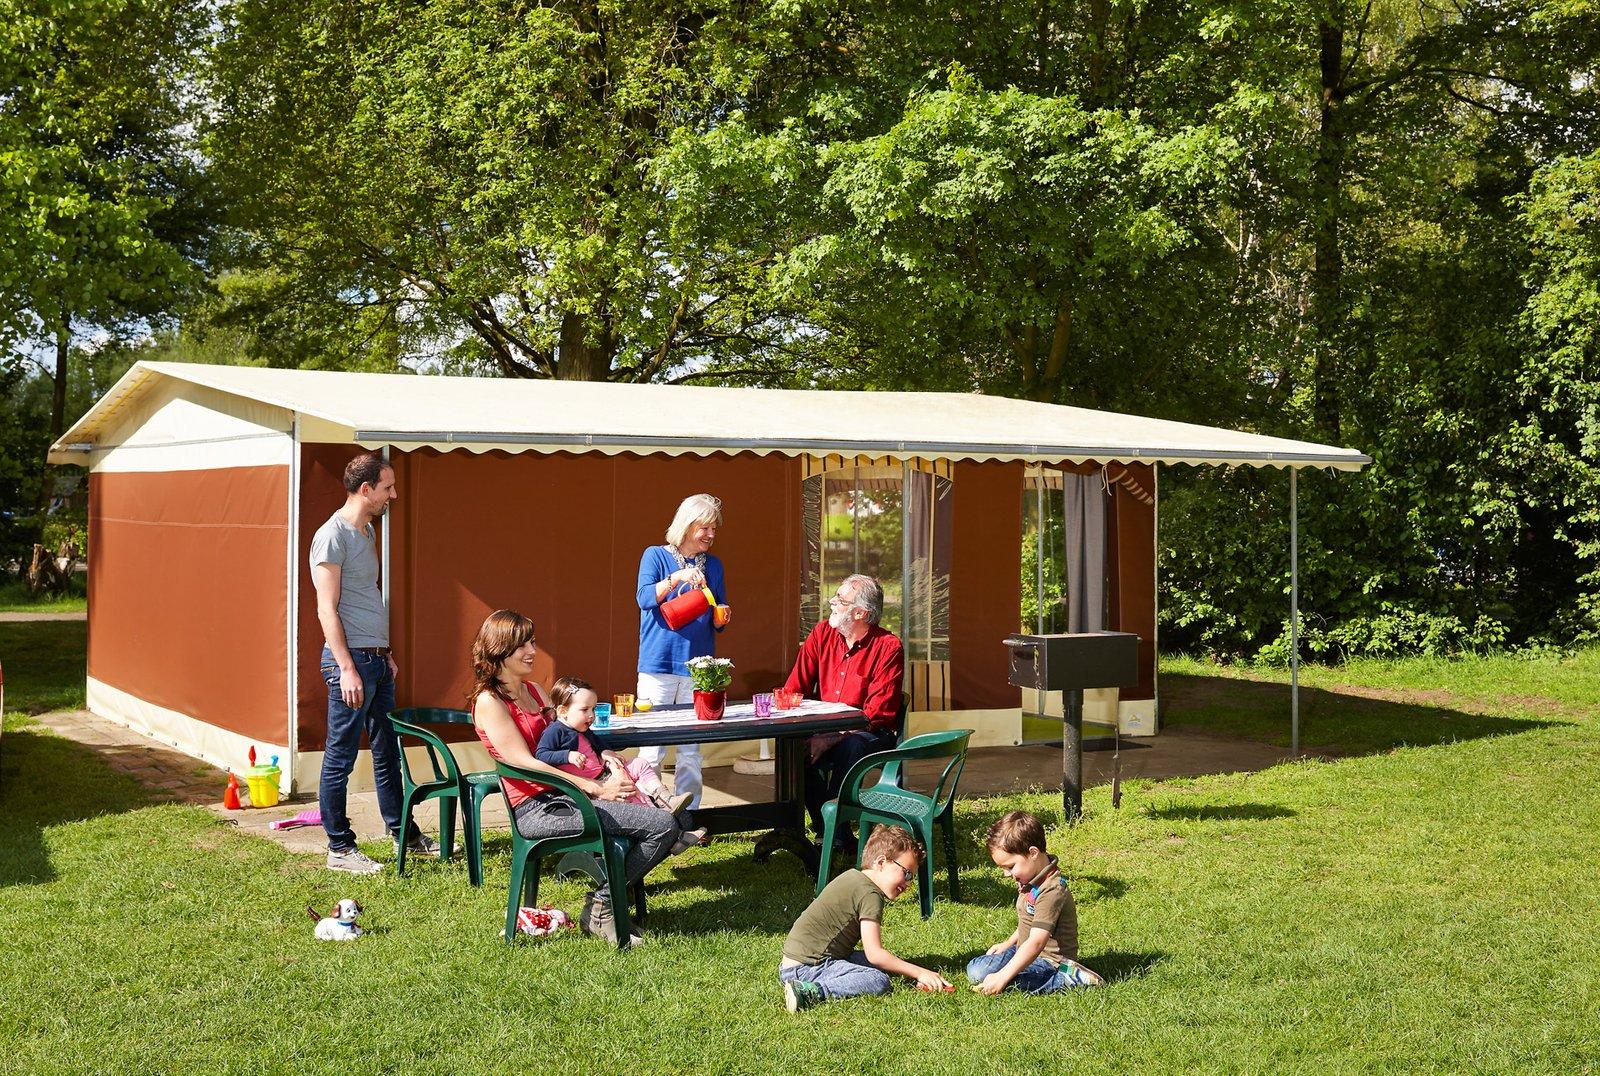 tent comfort plus vakantietent & Overnight stay in a spacious Bungalow Tent Plus | Beekse Bergen